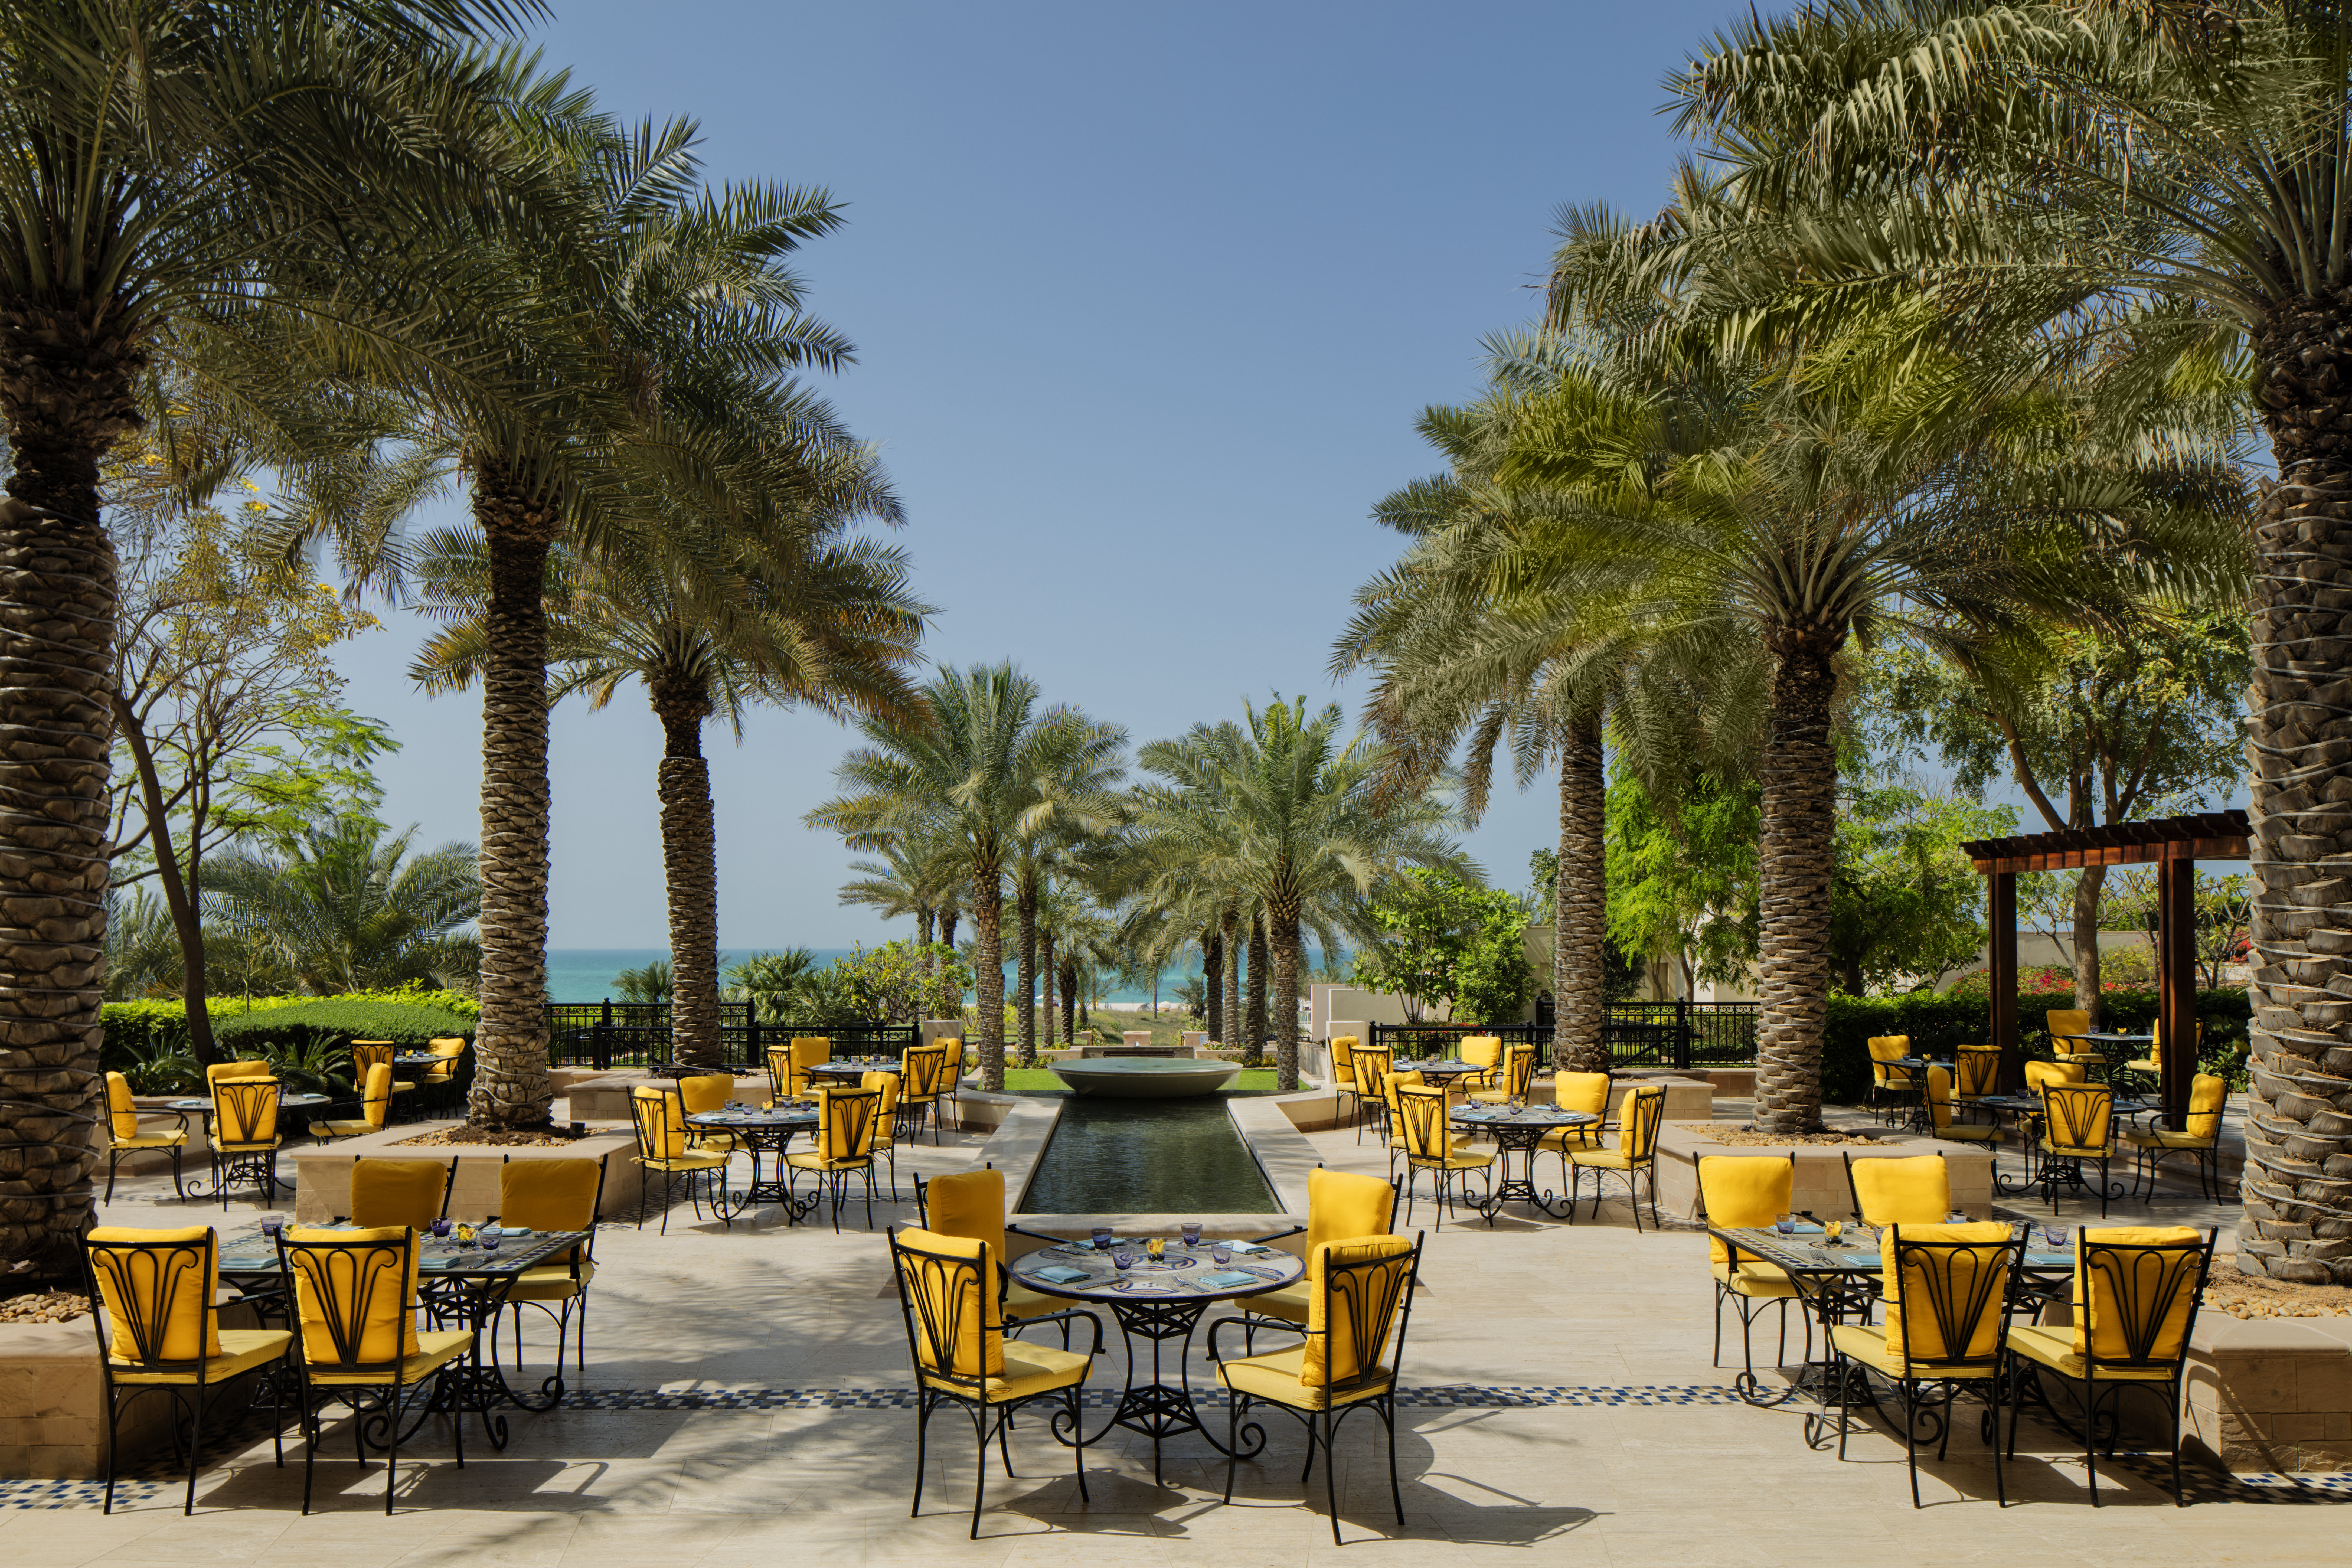 luxury-beach-resort-abu-dhabi